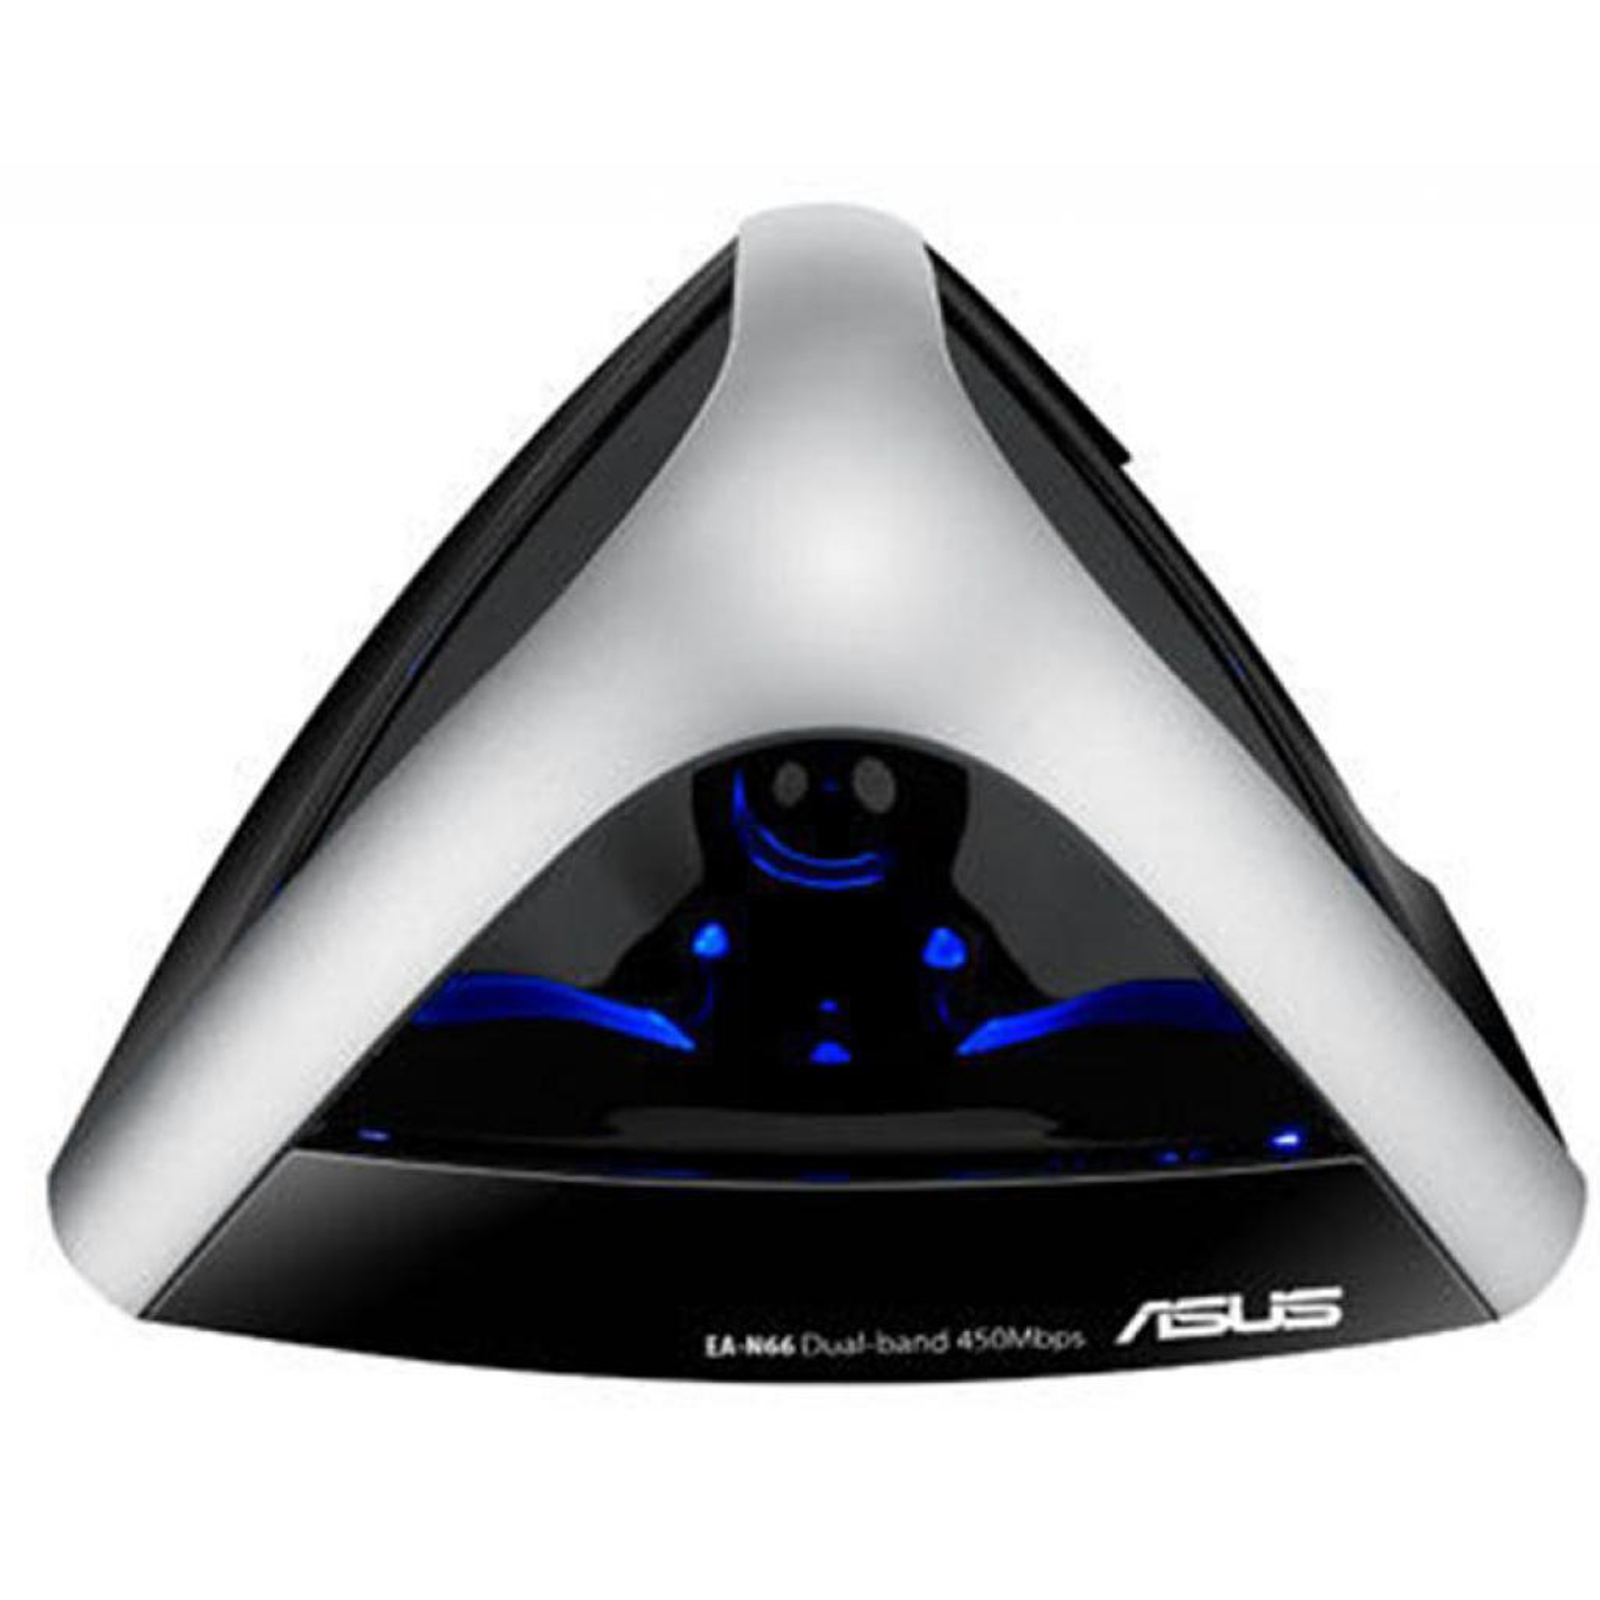 Сетевая карта Wi-Fi ASUS USB-N66 изображение 3